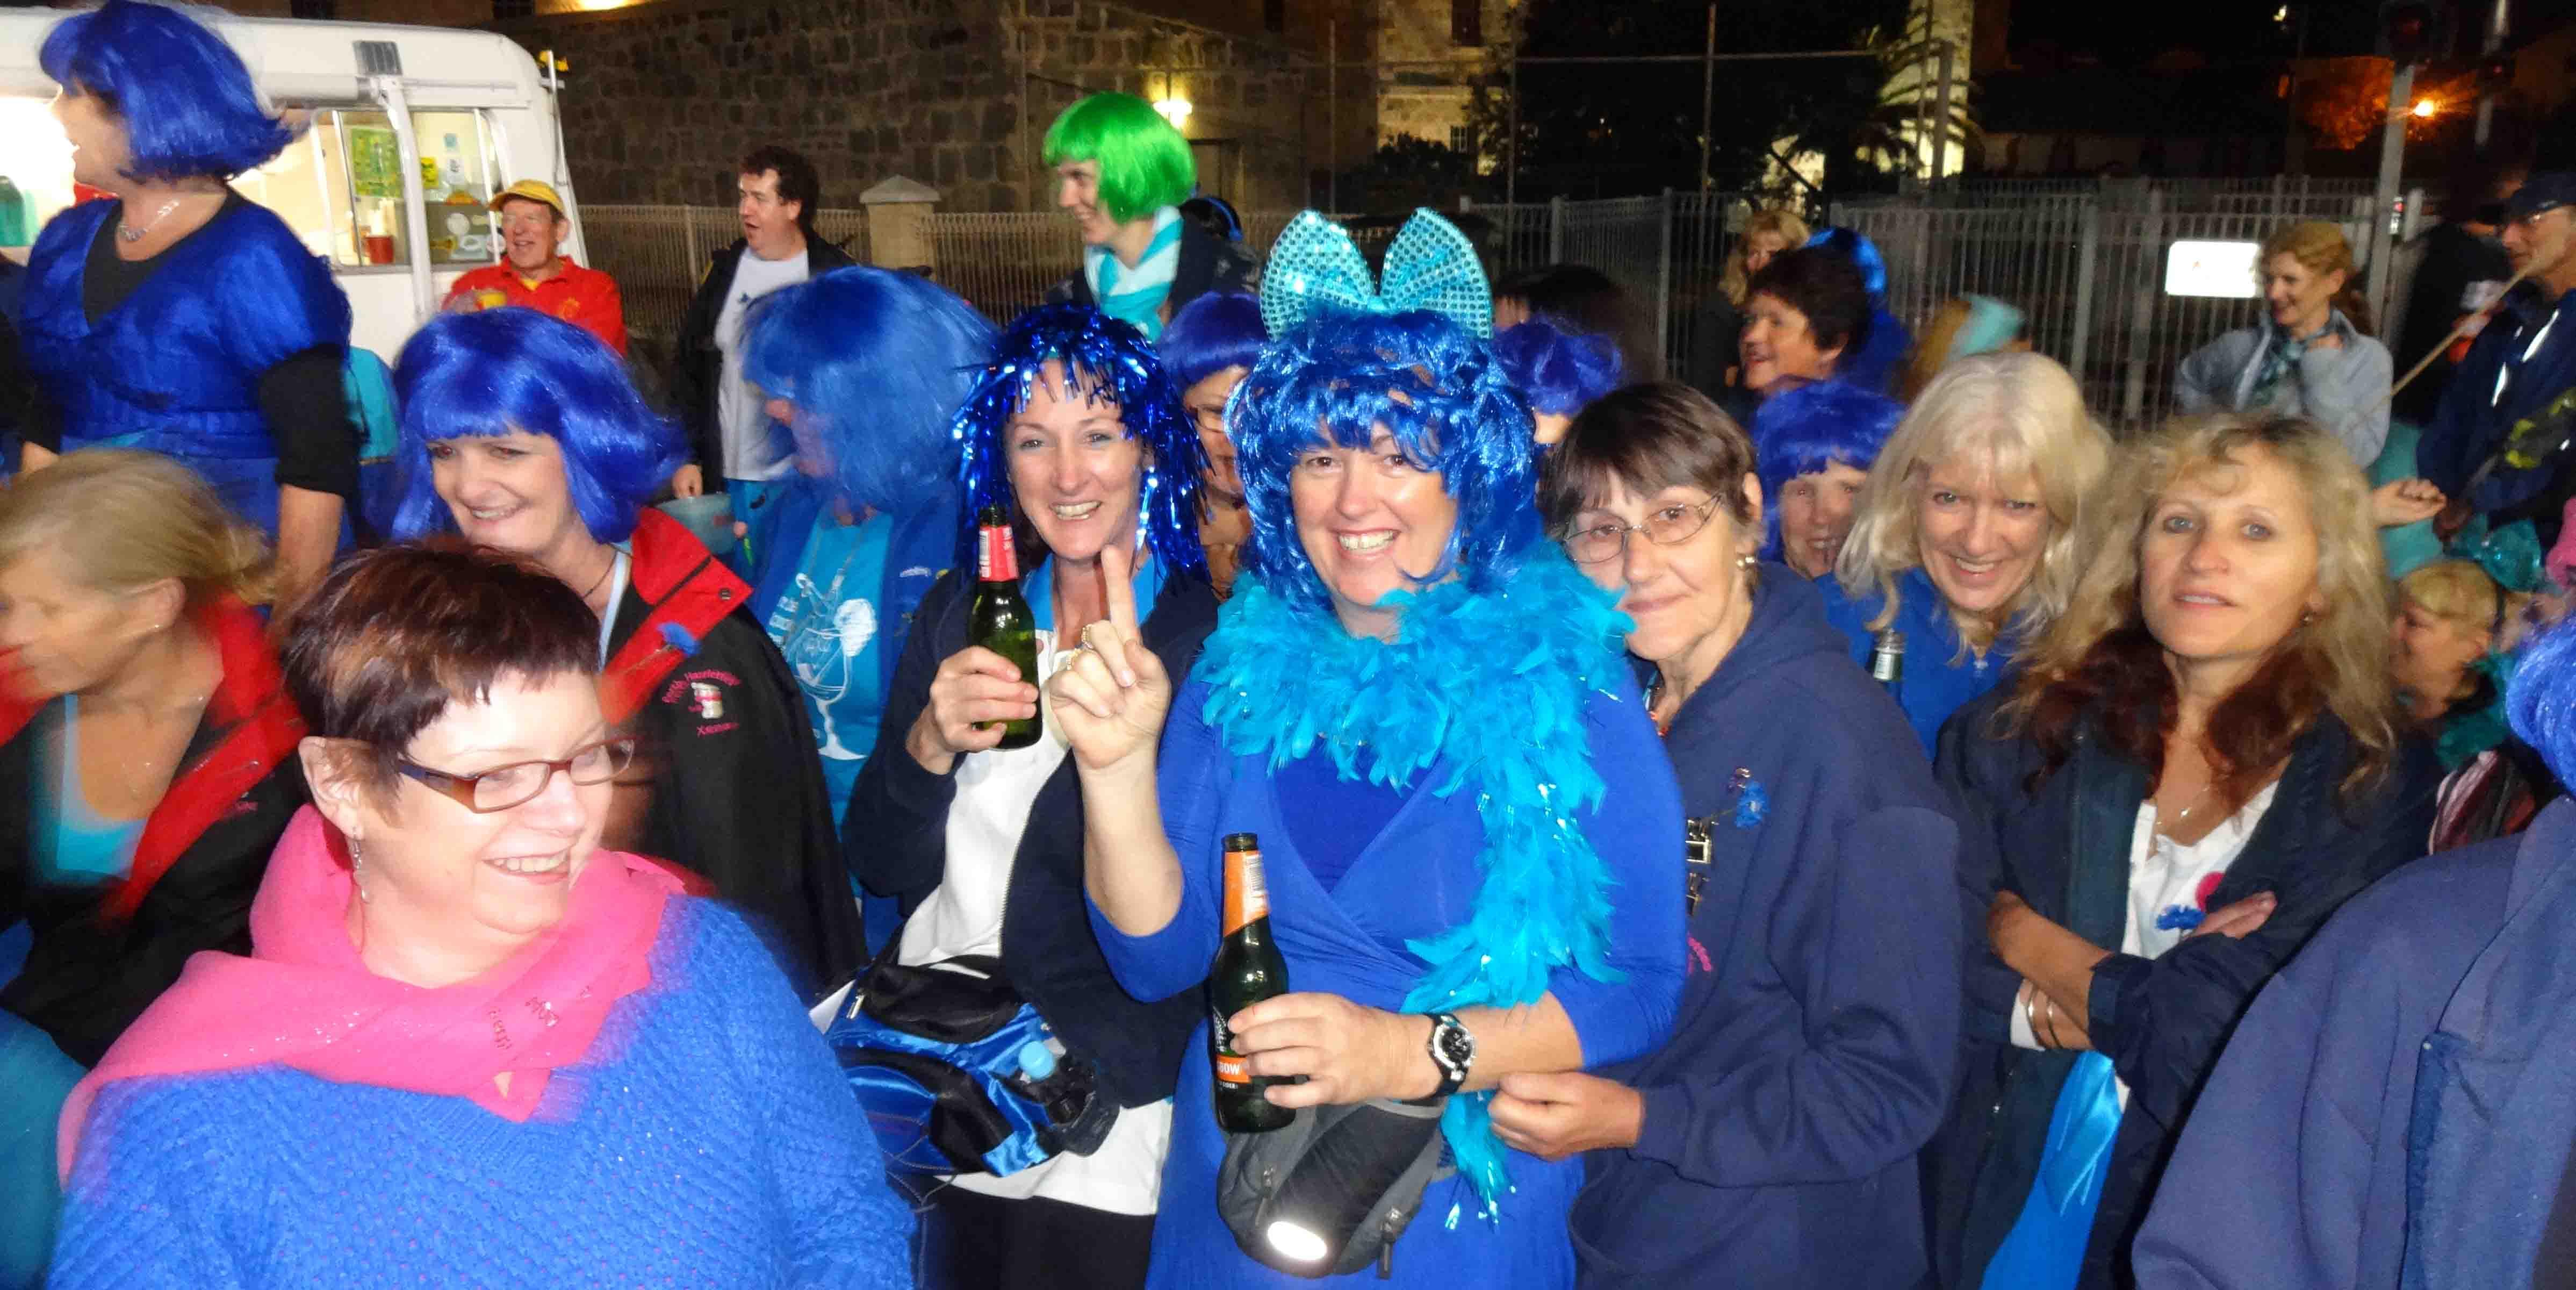 Blue Dress Run according to Wombat